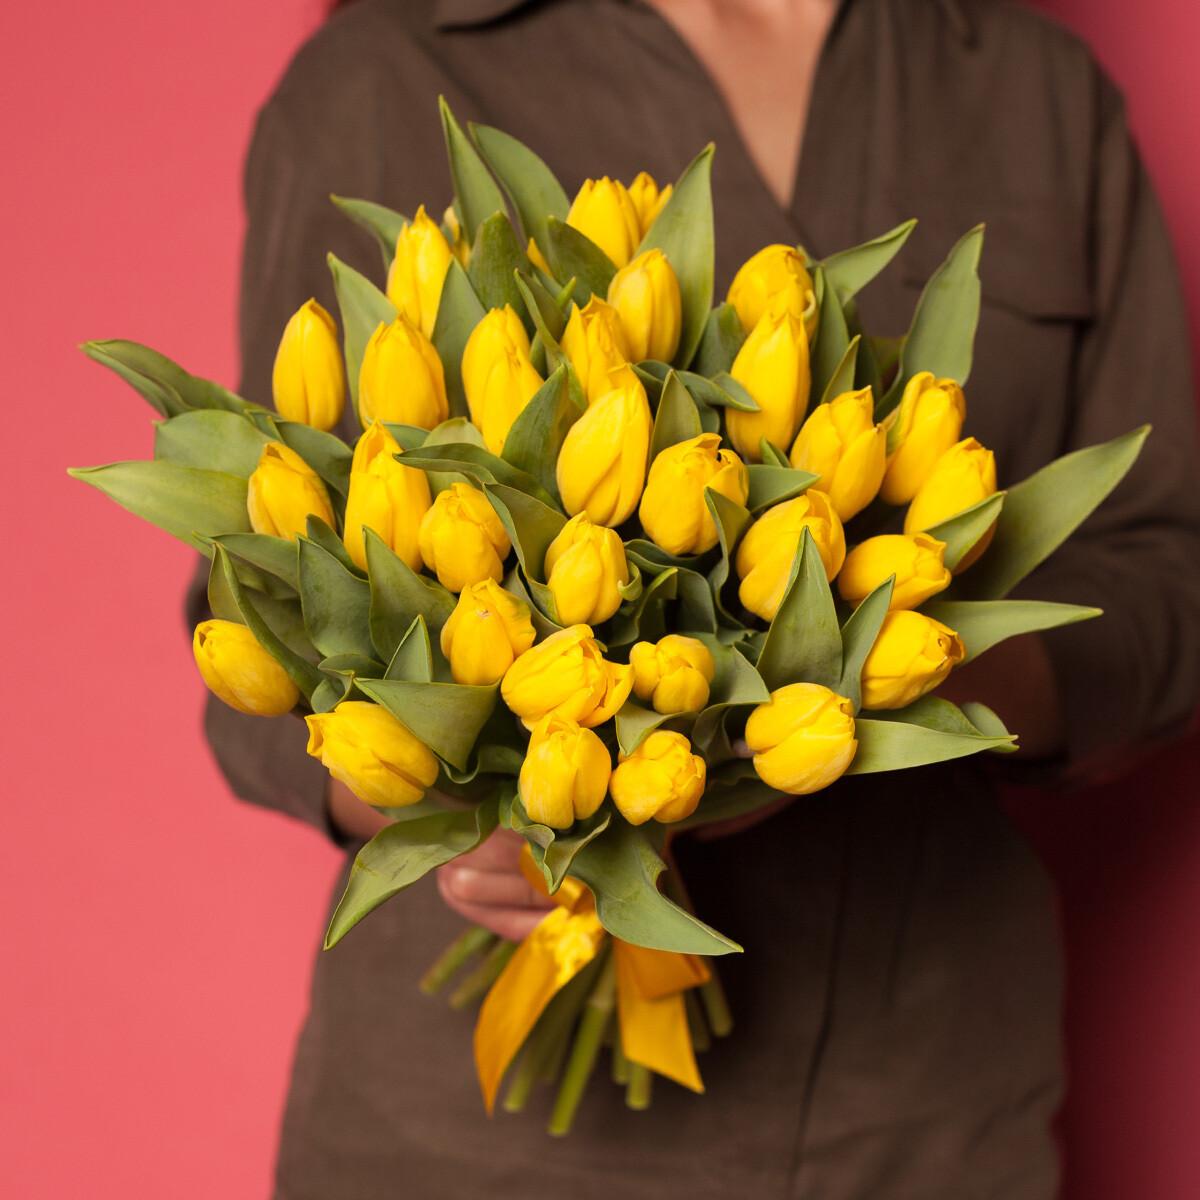 35 жёлтых тюльпанов